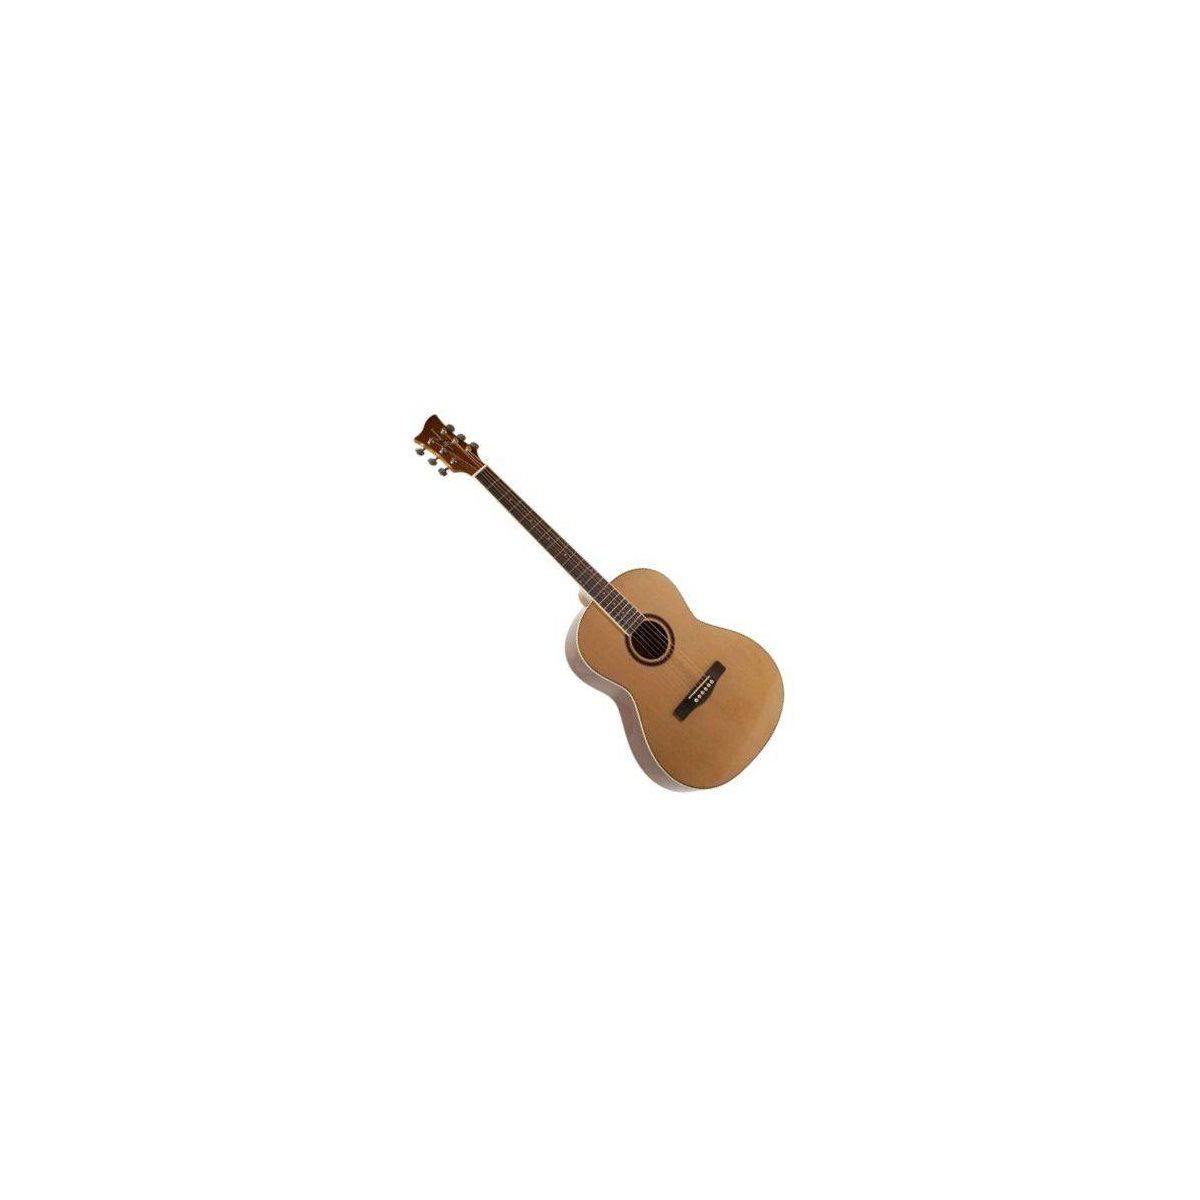 JAY TURSER - JTA524D-N - Dreadnought Acoustic Guitar - Natural